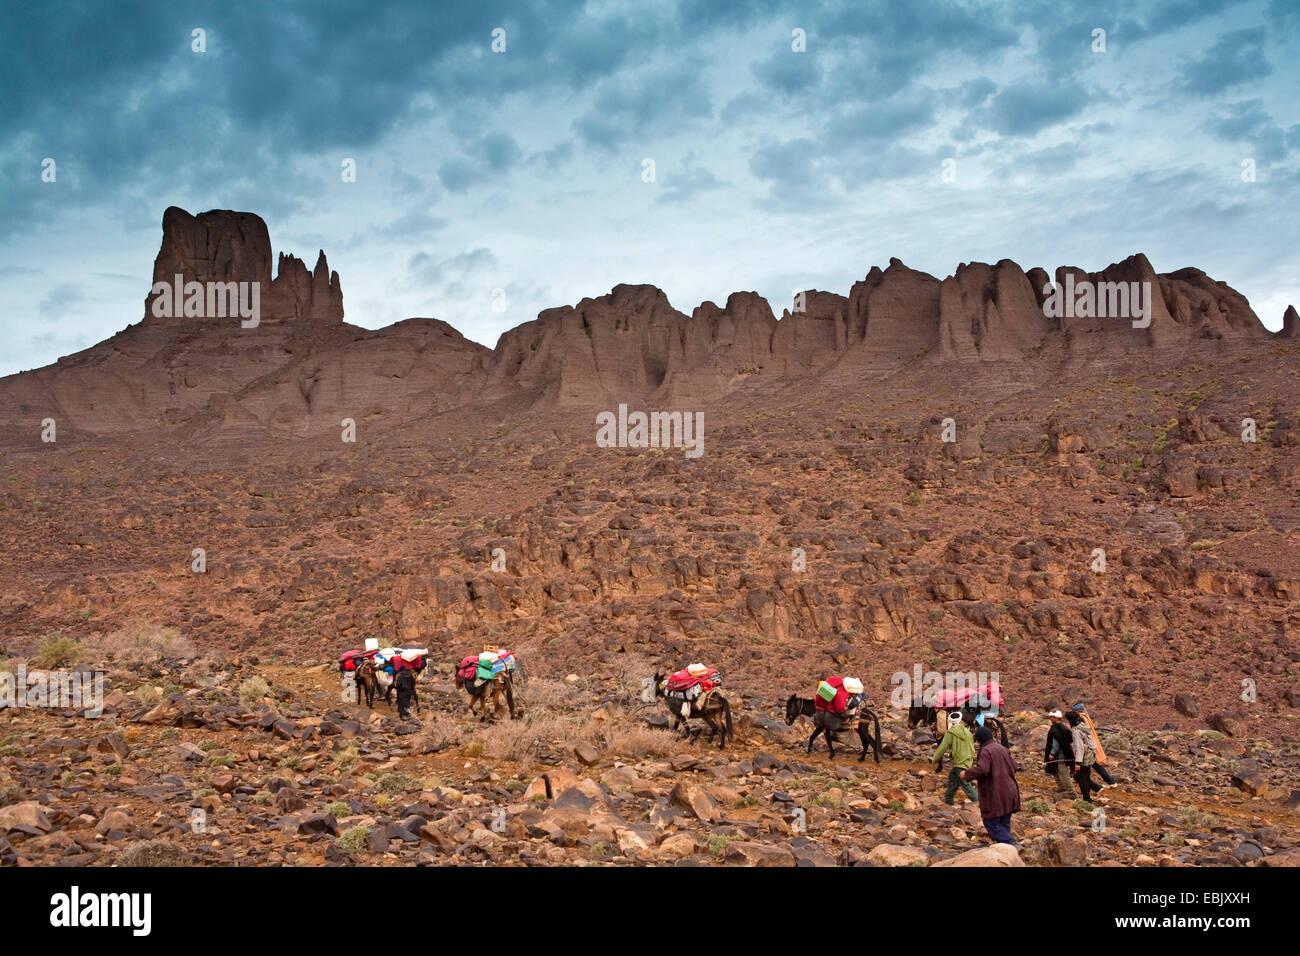 beasts of burden before the Rock, Morocco, Souss-Massa-Dara�, Djebel Sarhro - Stock Image